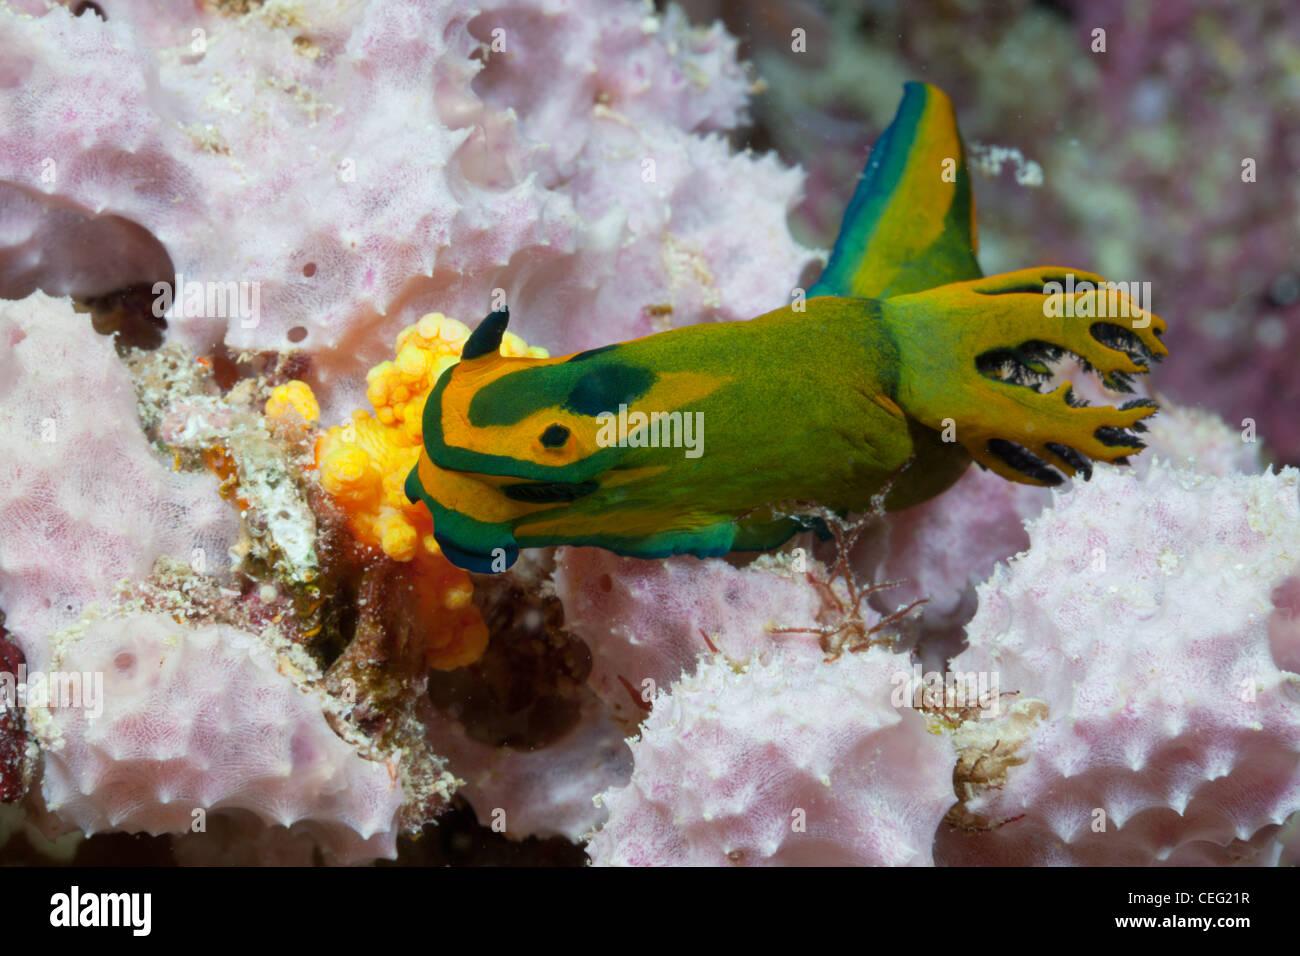 Babosa de mar, Tambja olivaria, Baa Atoll, Maldivas, Océano Índico Imagen De Stock